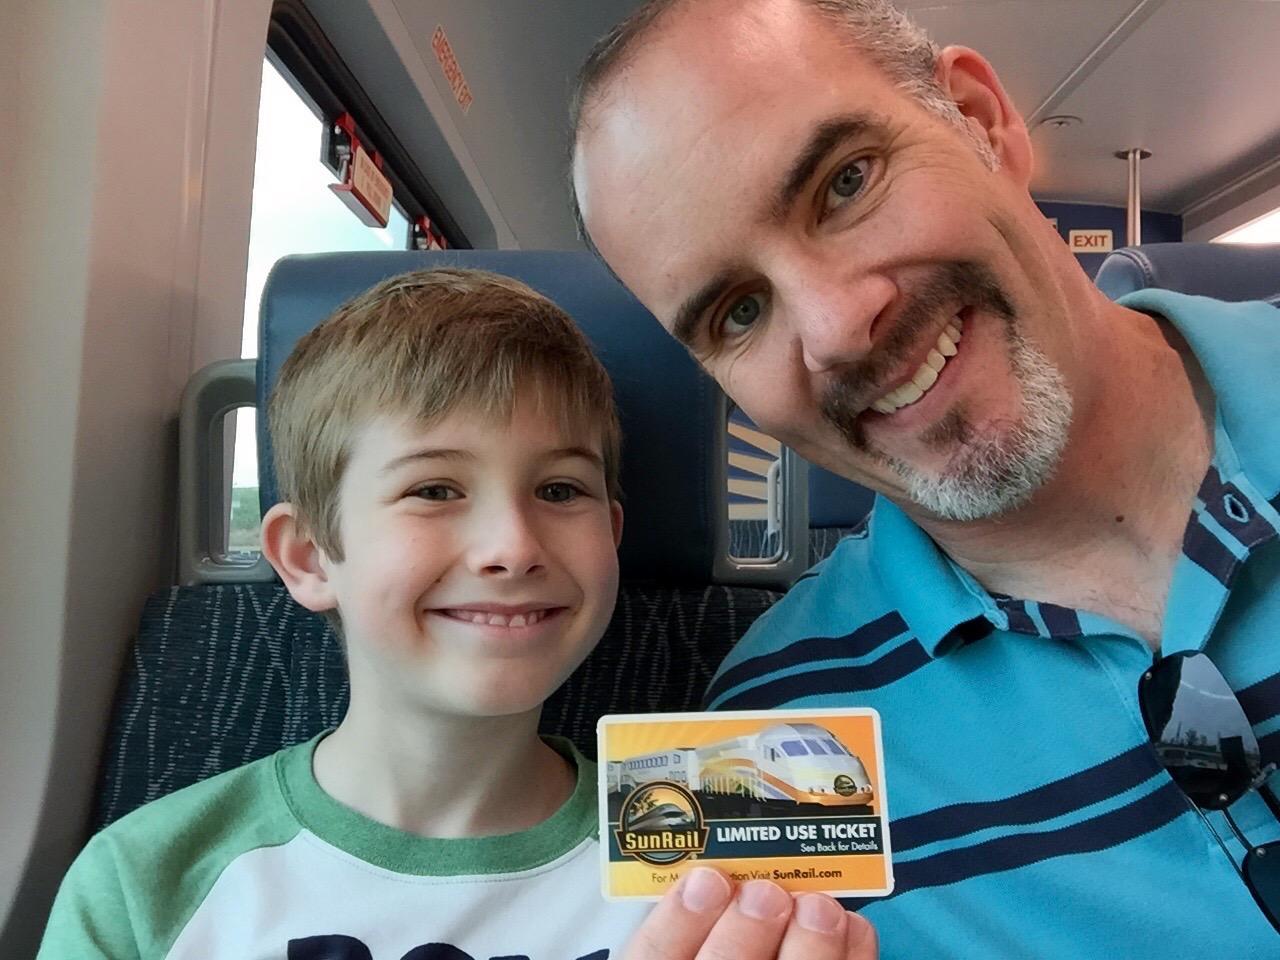 Sunrail Train Ticket to Ride